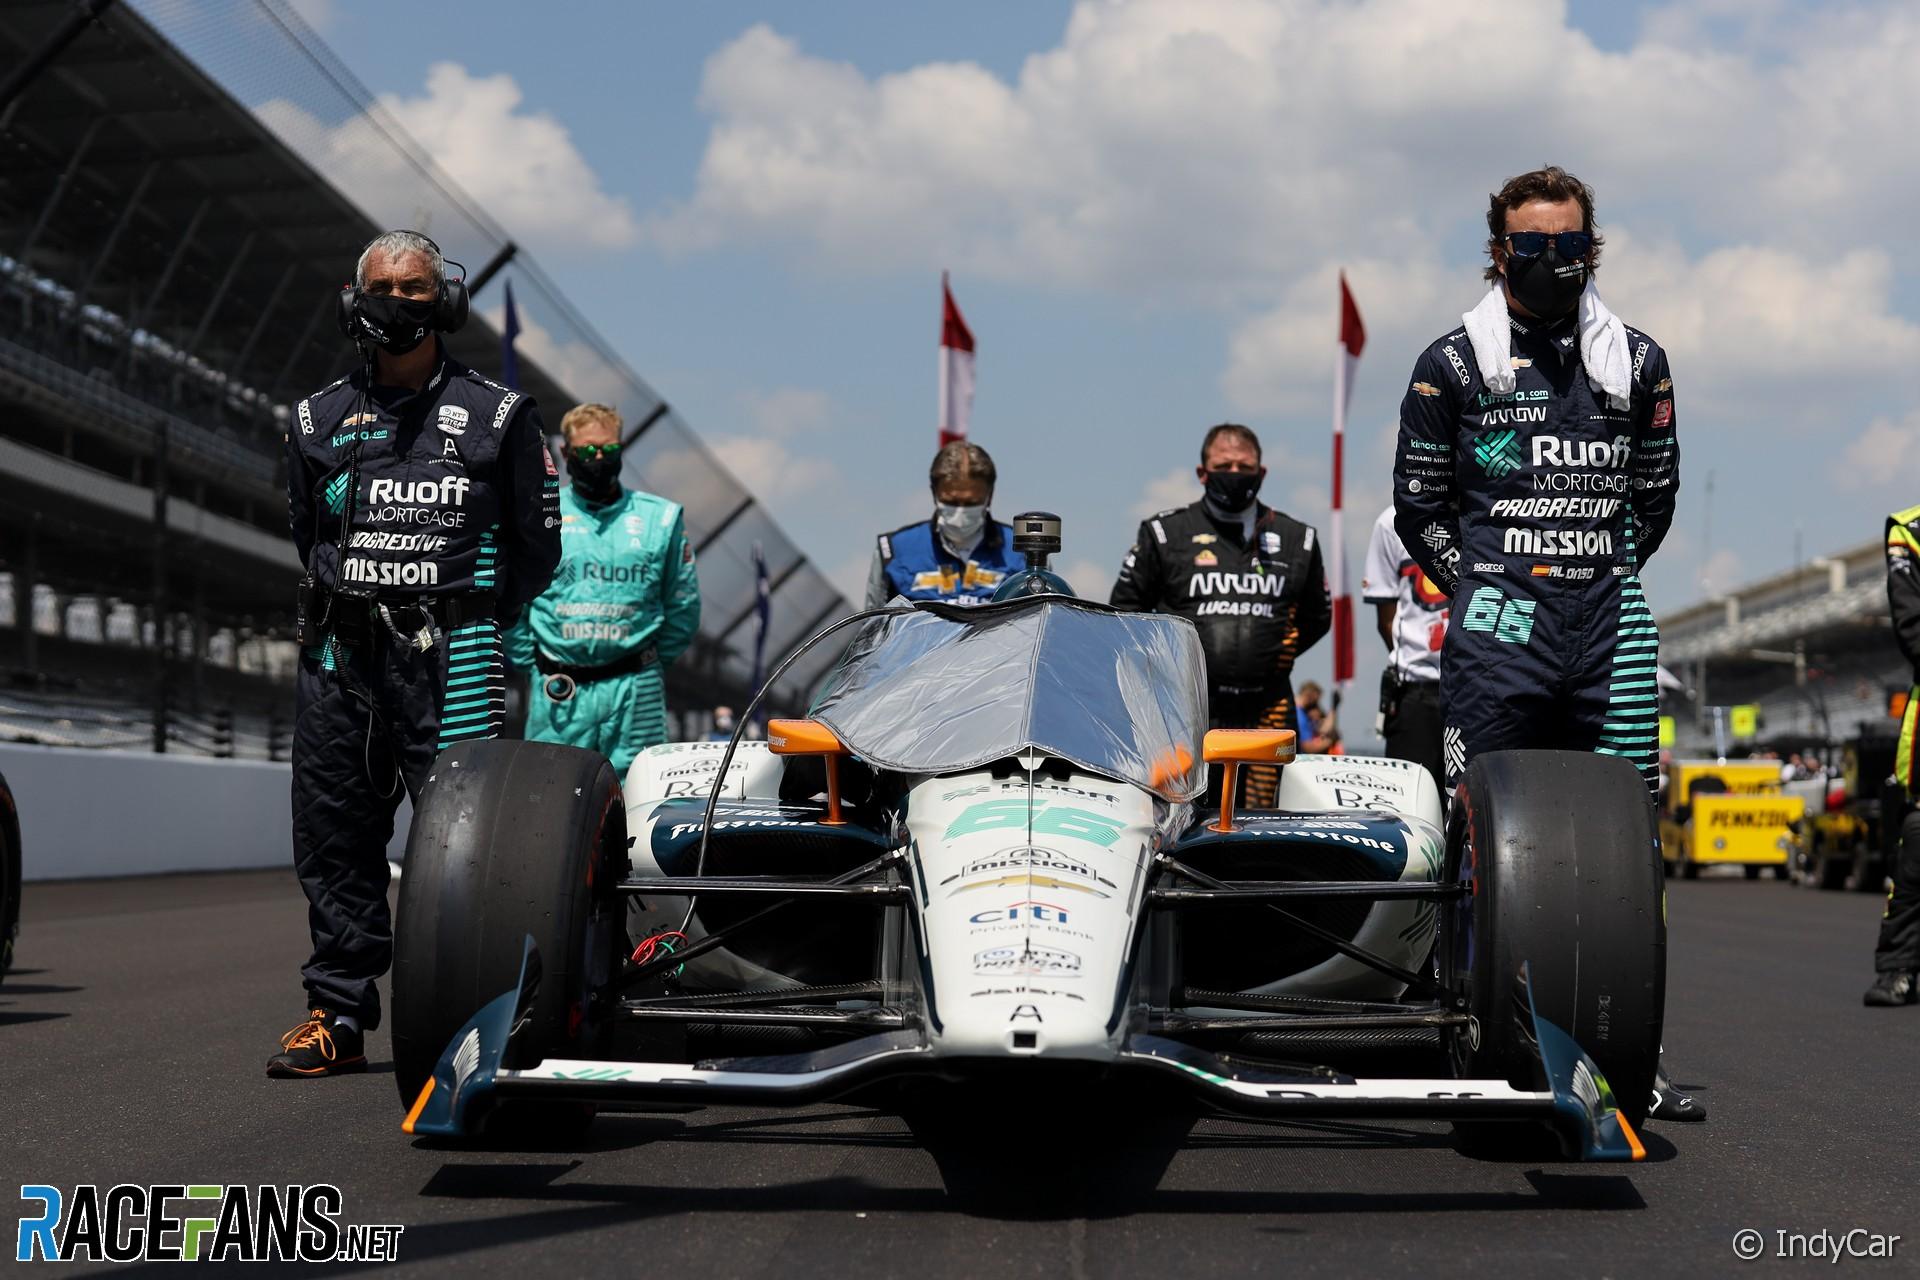 Fernando Alonso, McLaren, IndyCar, Indianapolis 500, 2020